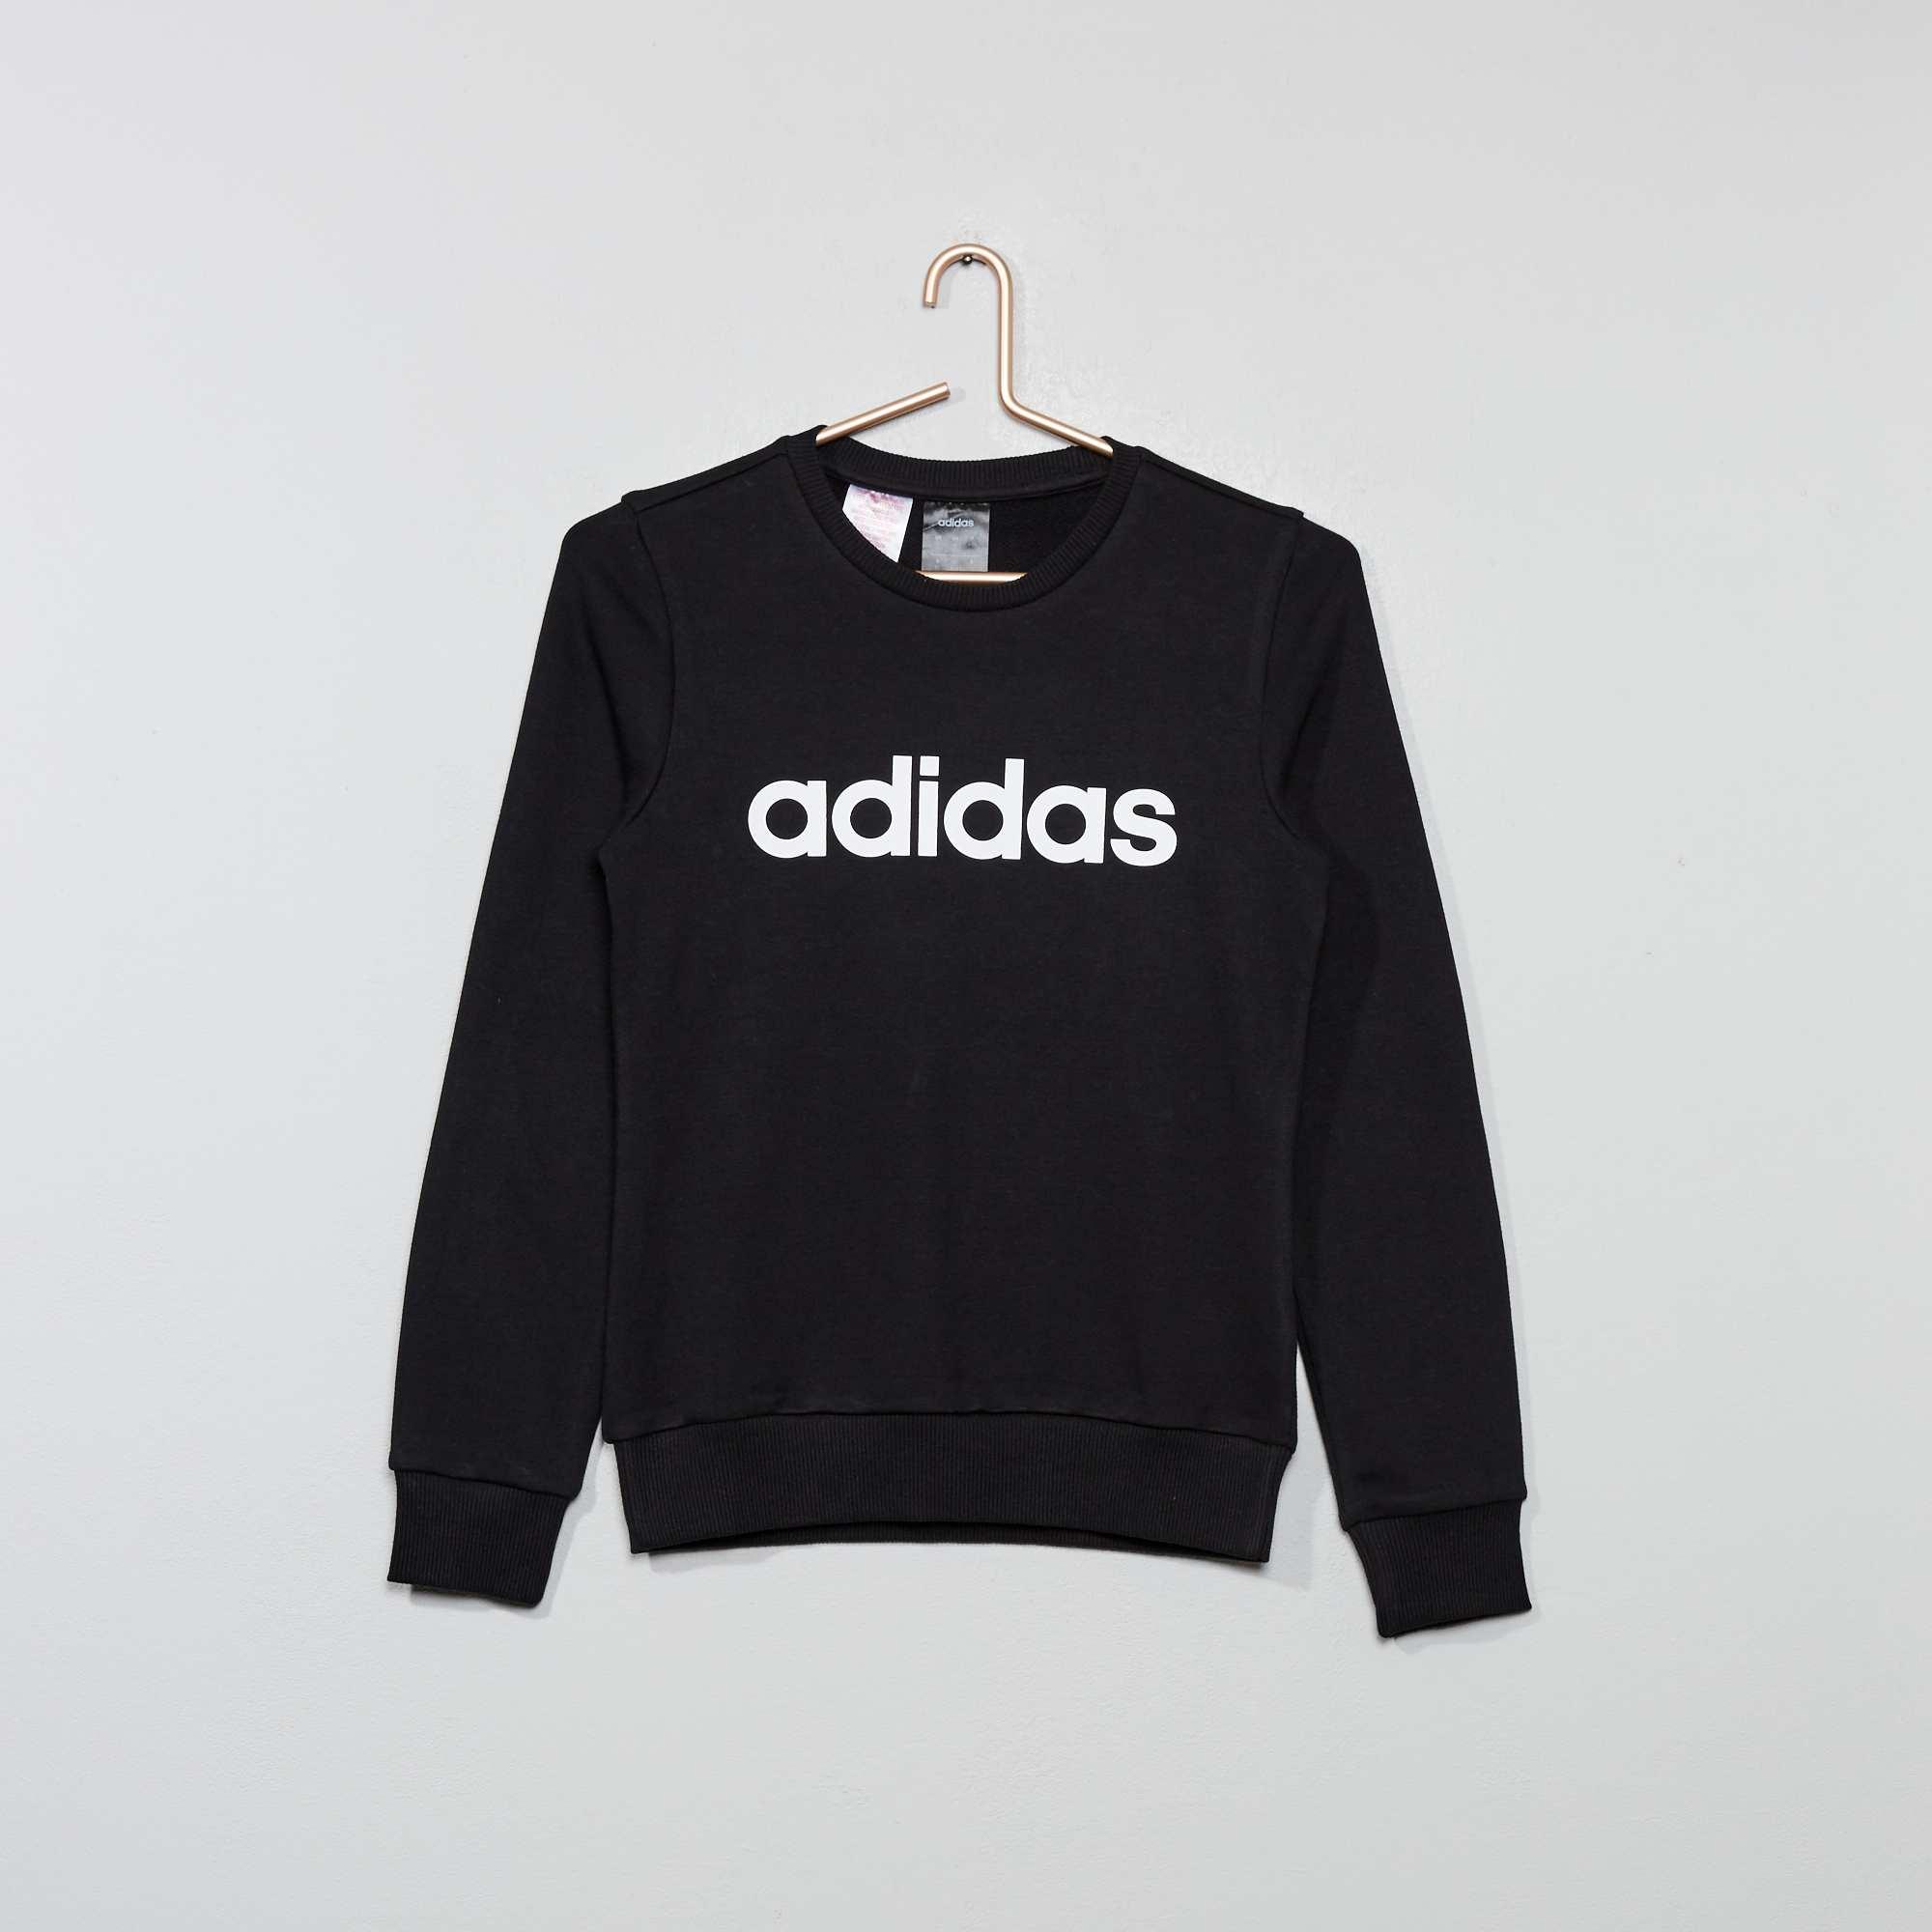 Fille 'adidas' Kiabi Noir 35 00€ Adolescente Sweat OPknw0